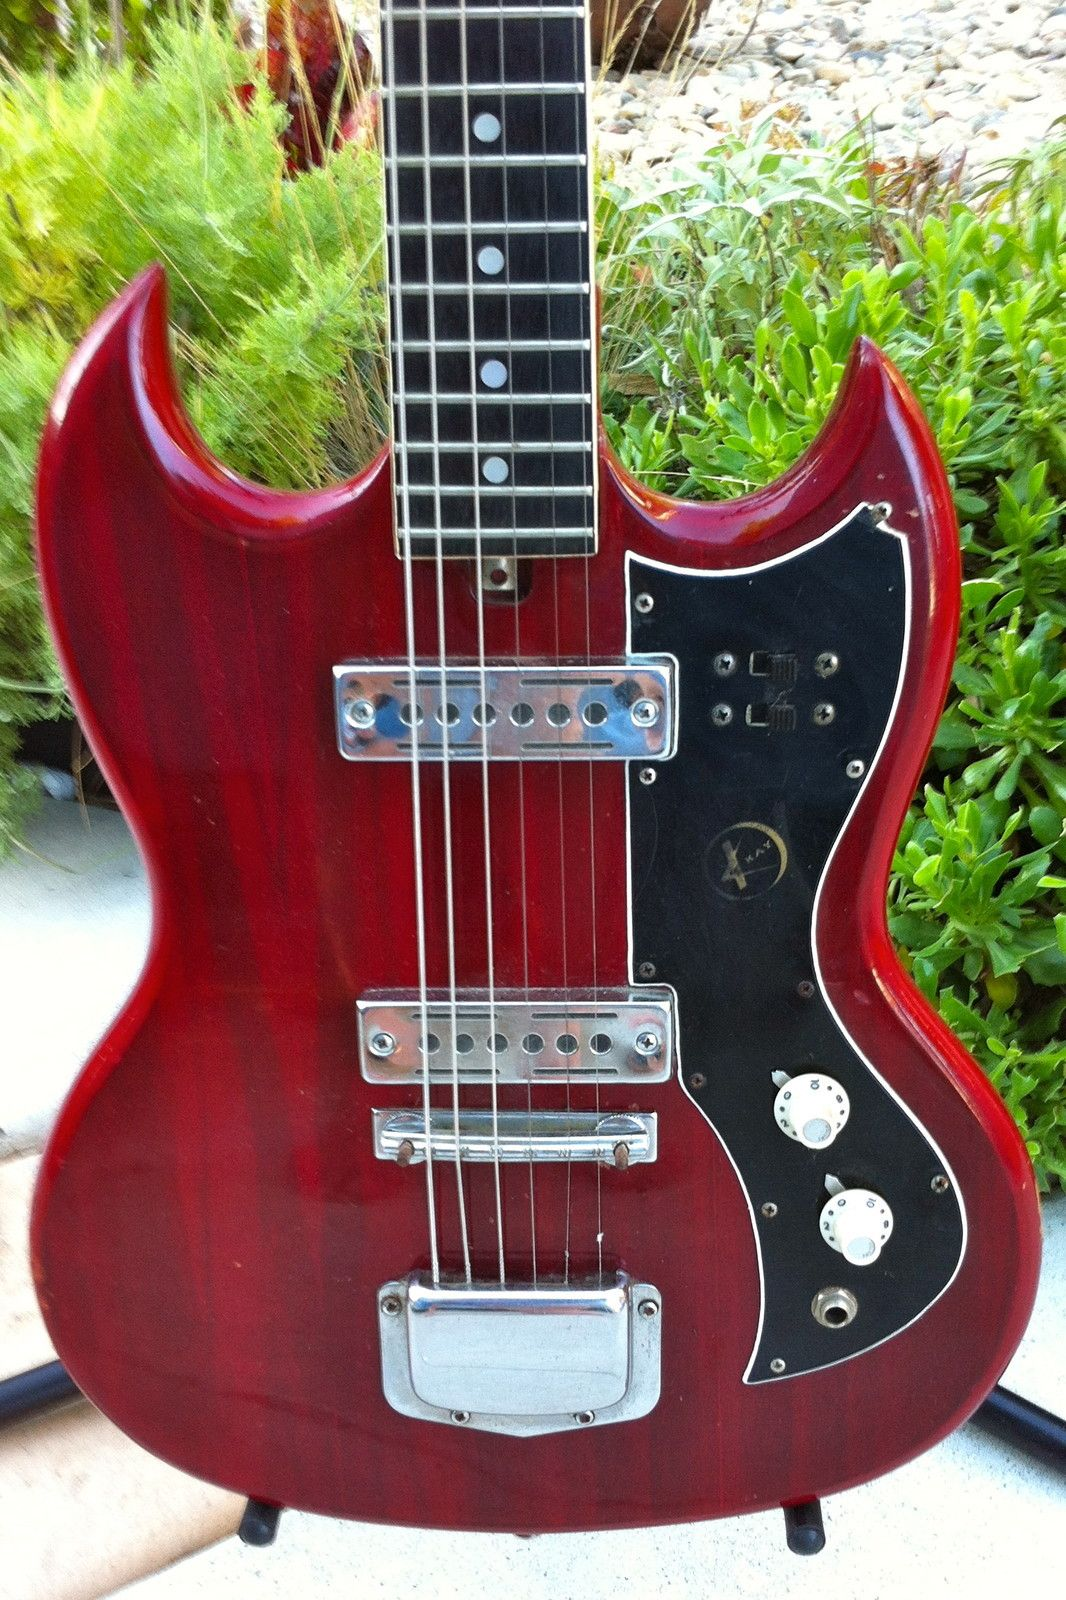 free download wiring diagram: Vintage 60\u0027s Kay K 2 Sg Style Guitar 60 S Guitars & Guitar Telstar Wiring Diagram Free Download Wiring Diagram | Xwiaw ...